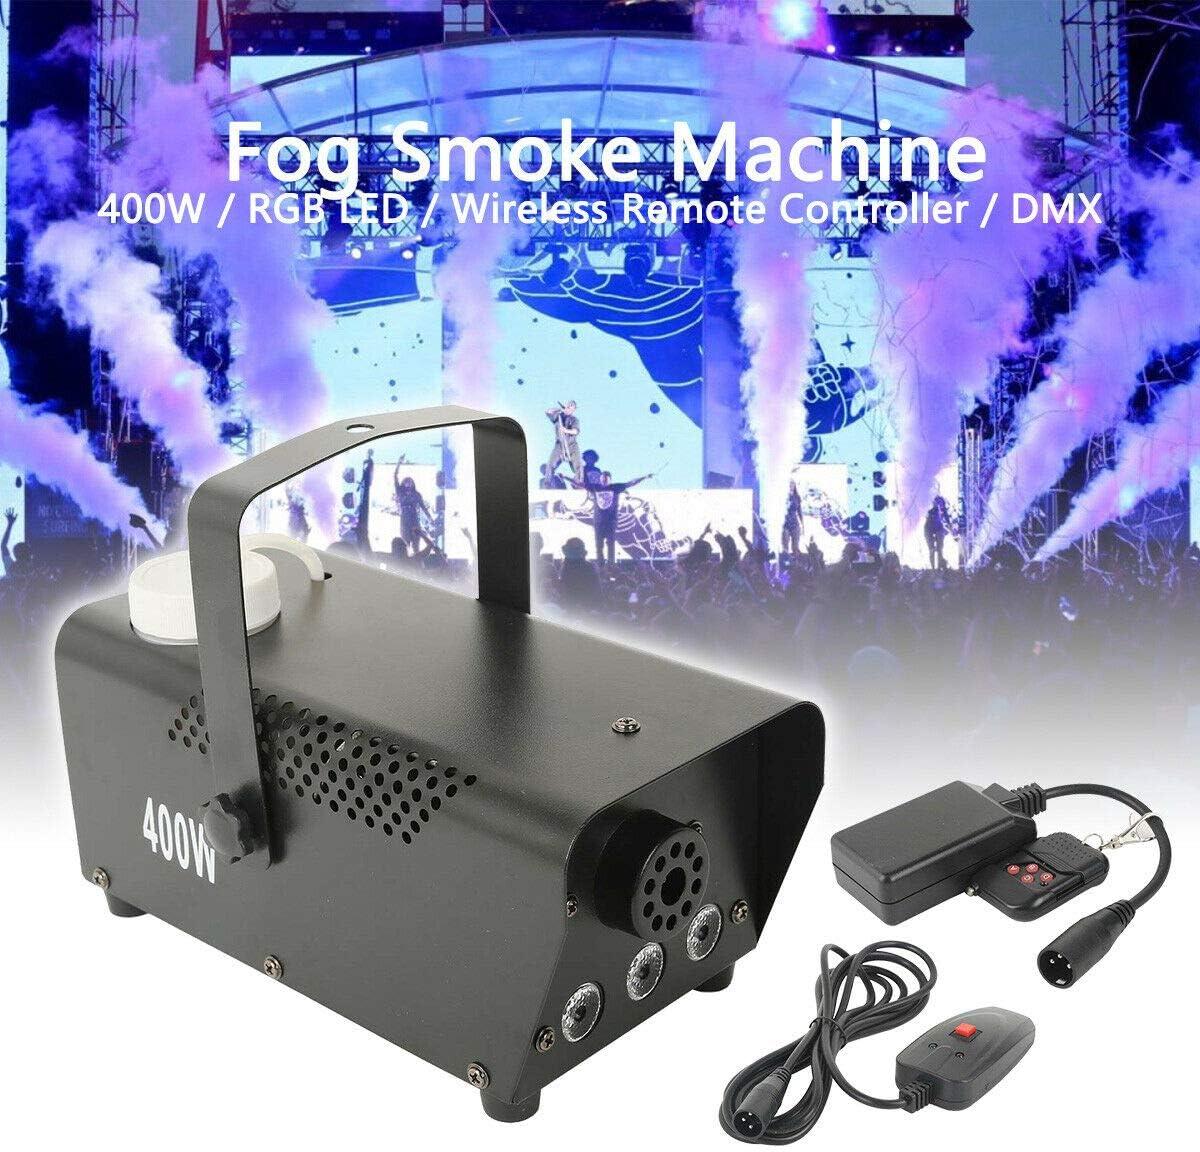 Tengchang Direct sale of manufacturer Professional 400W Fog Smoke 3X3W Machine safety RGB LED l